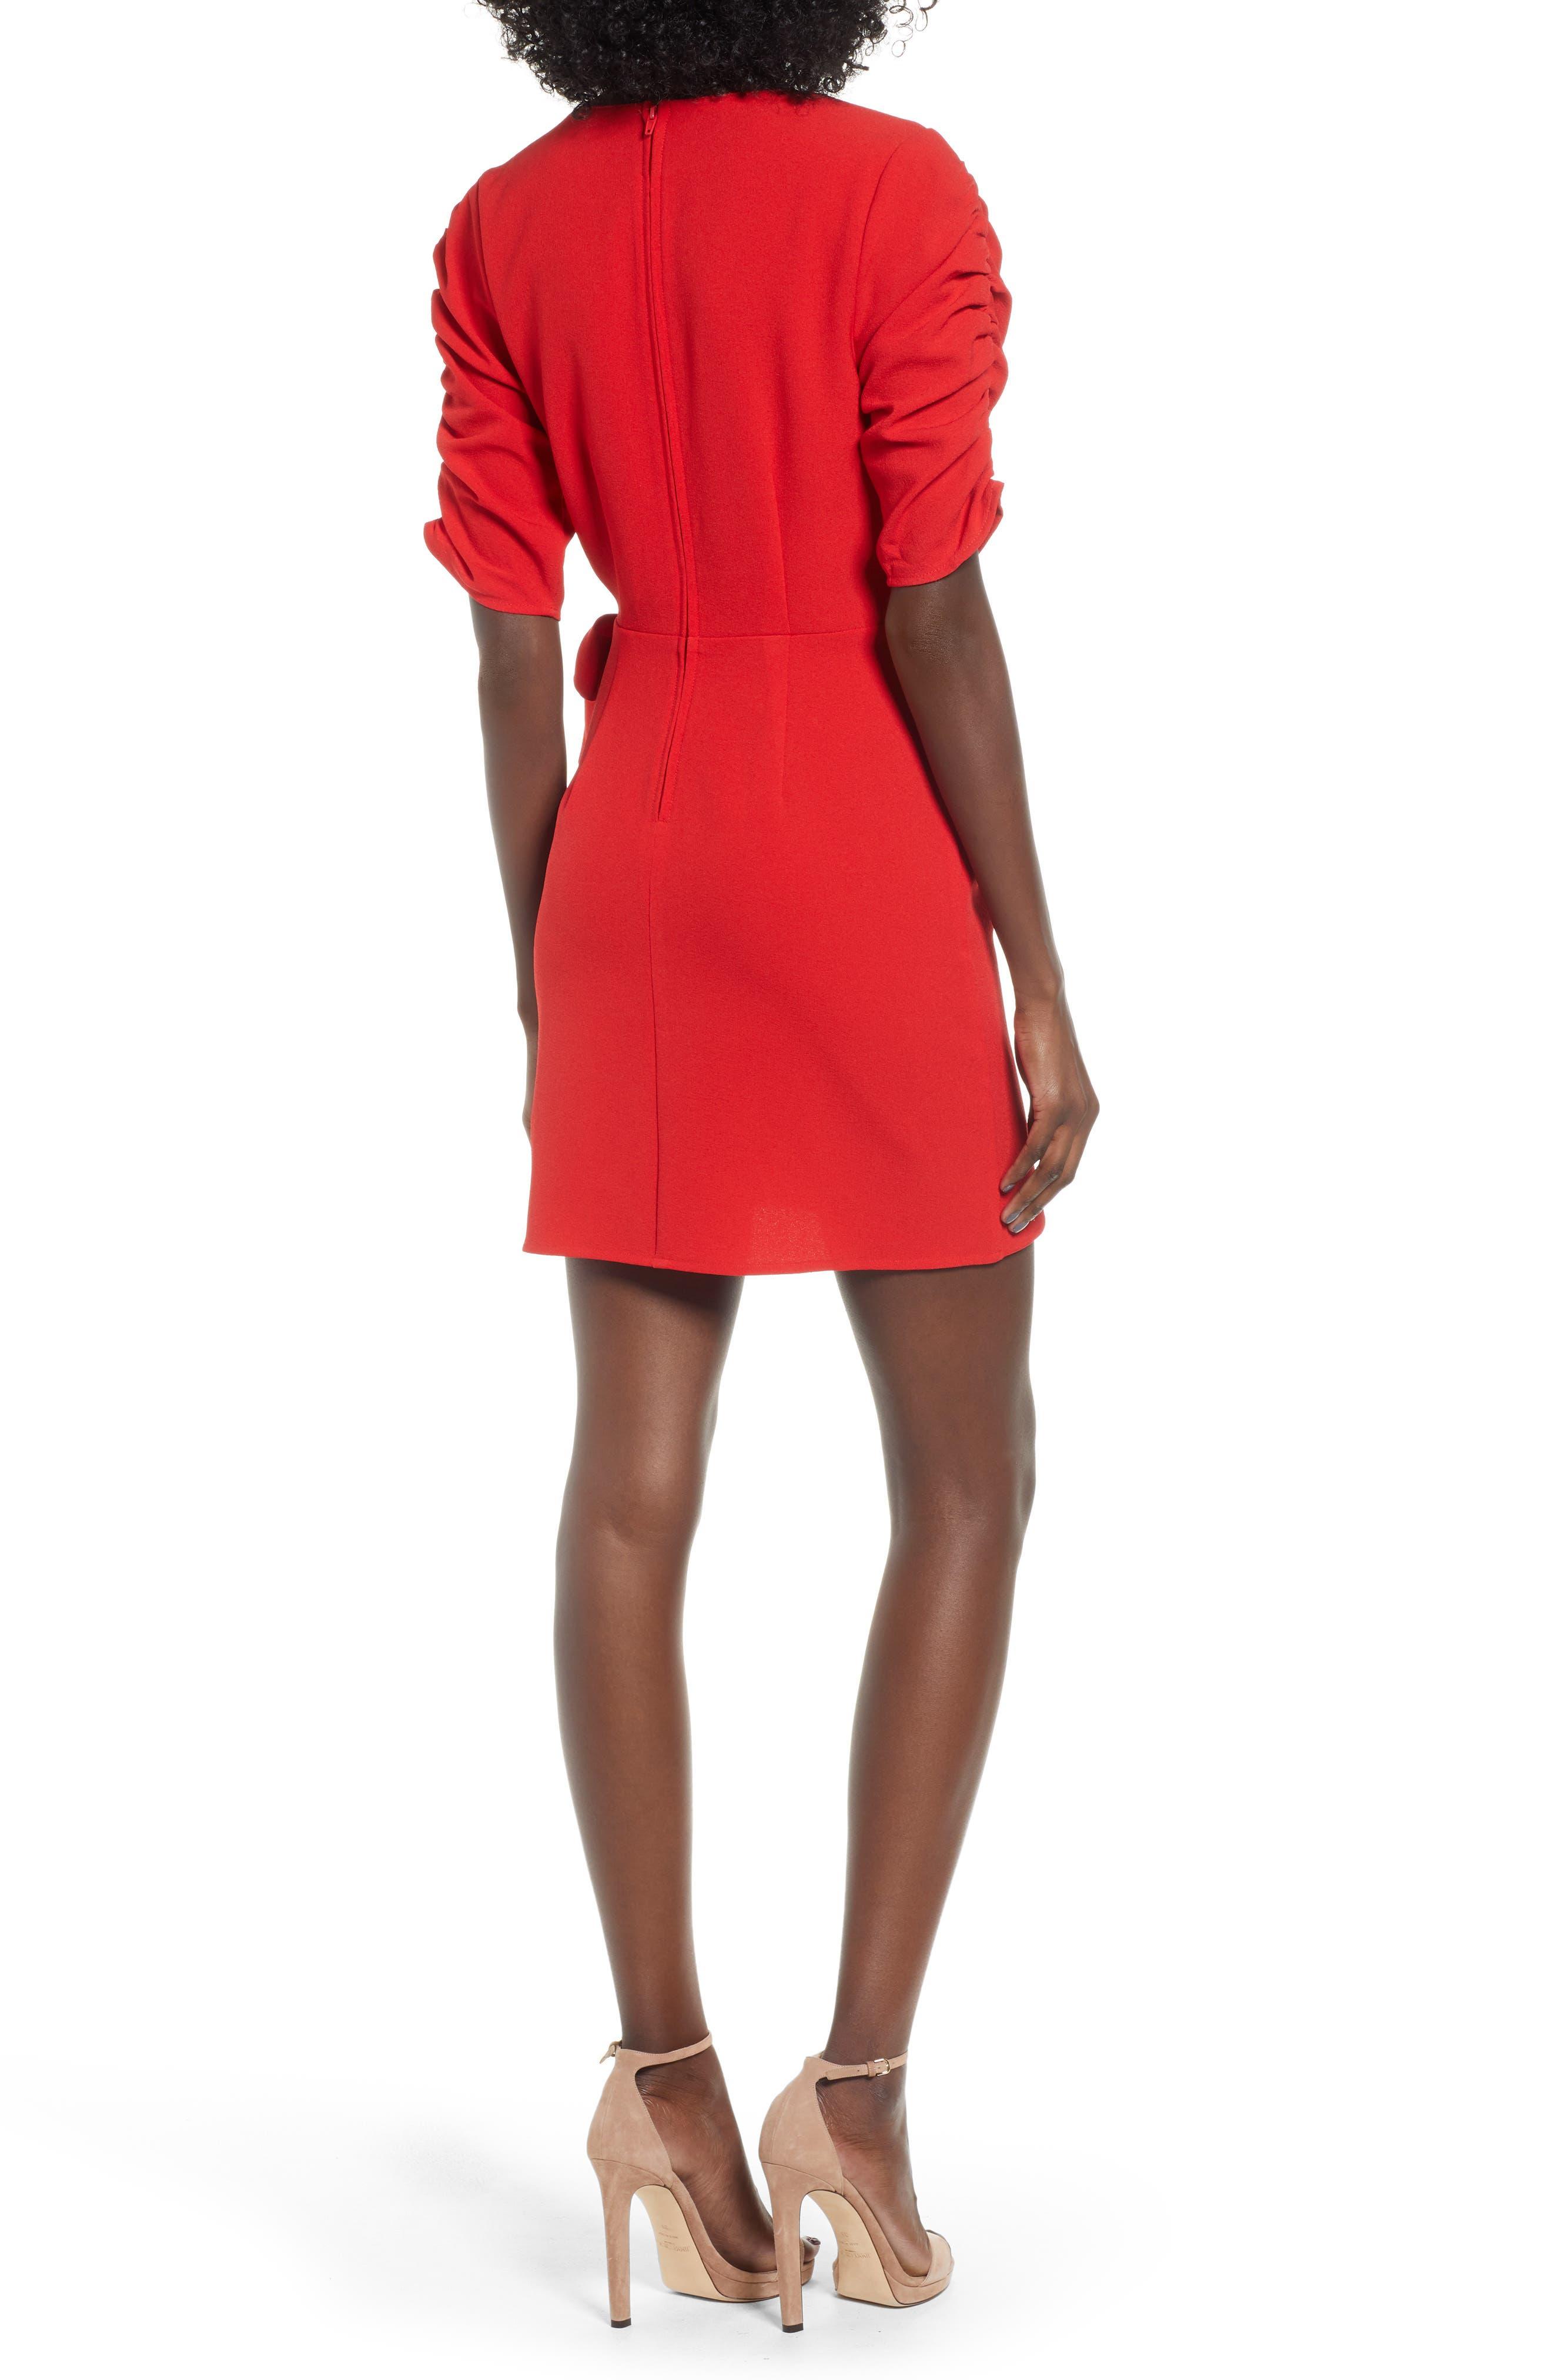 SPEECHLESS, Cinch Sleeve Faux Wrap Dress, Alternate thumbnail 2, color, 600